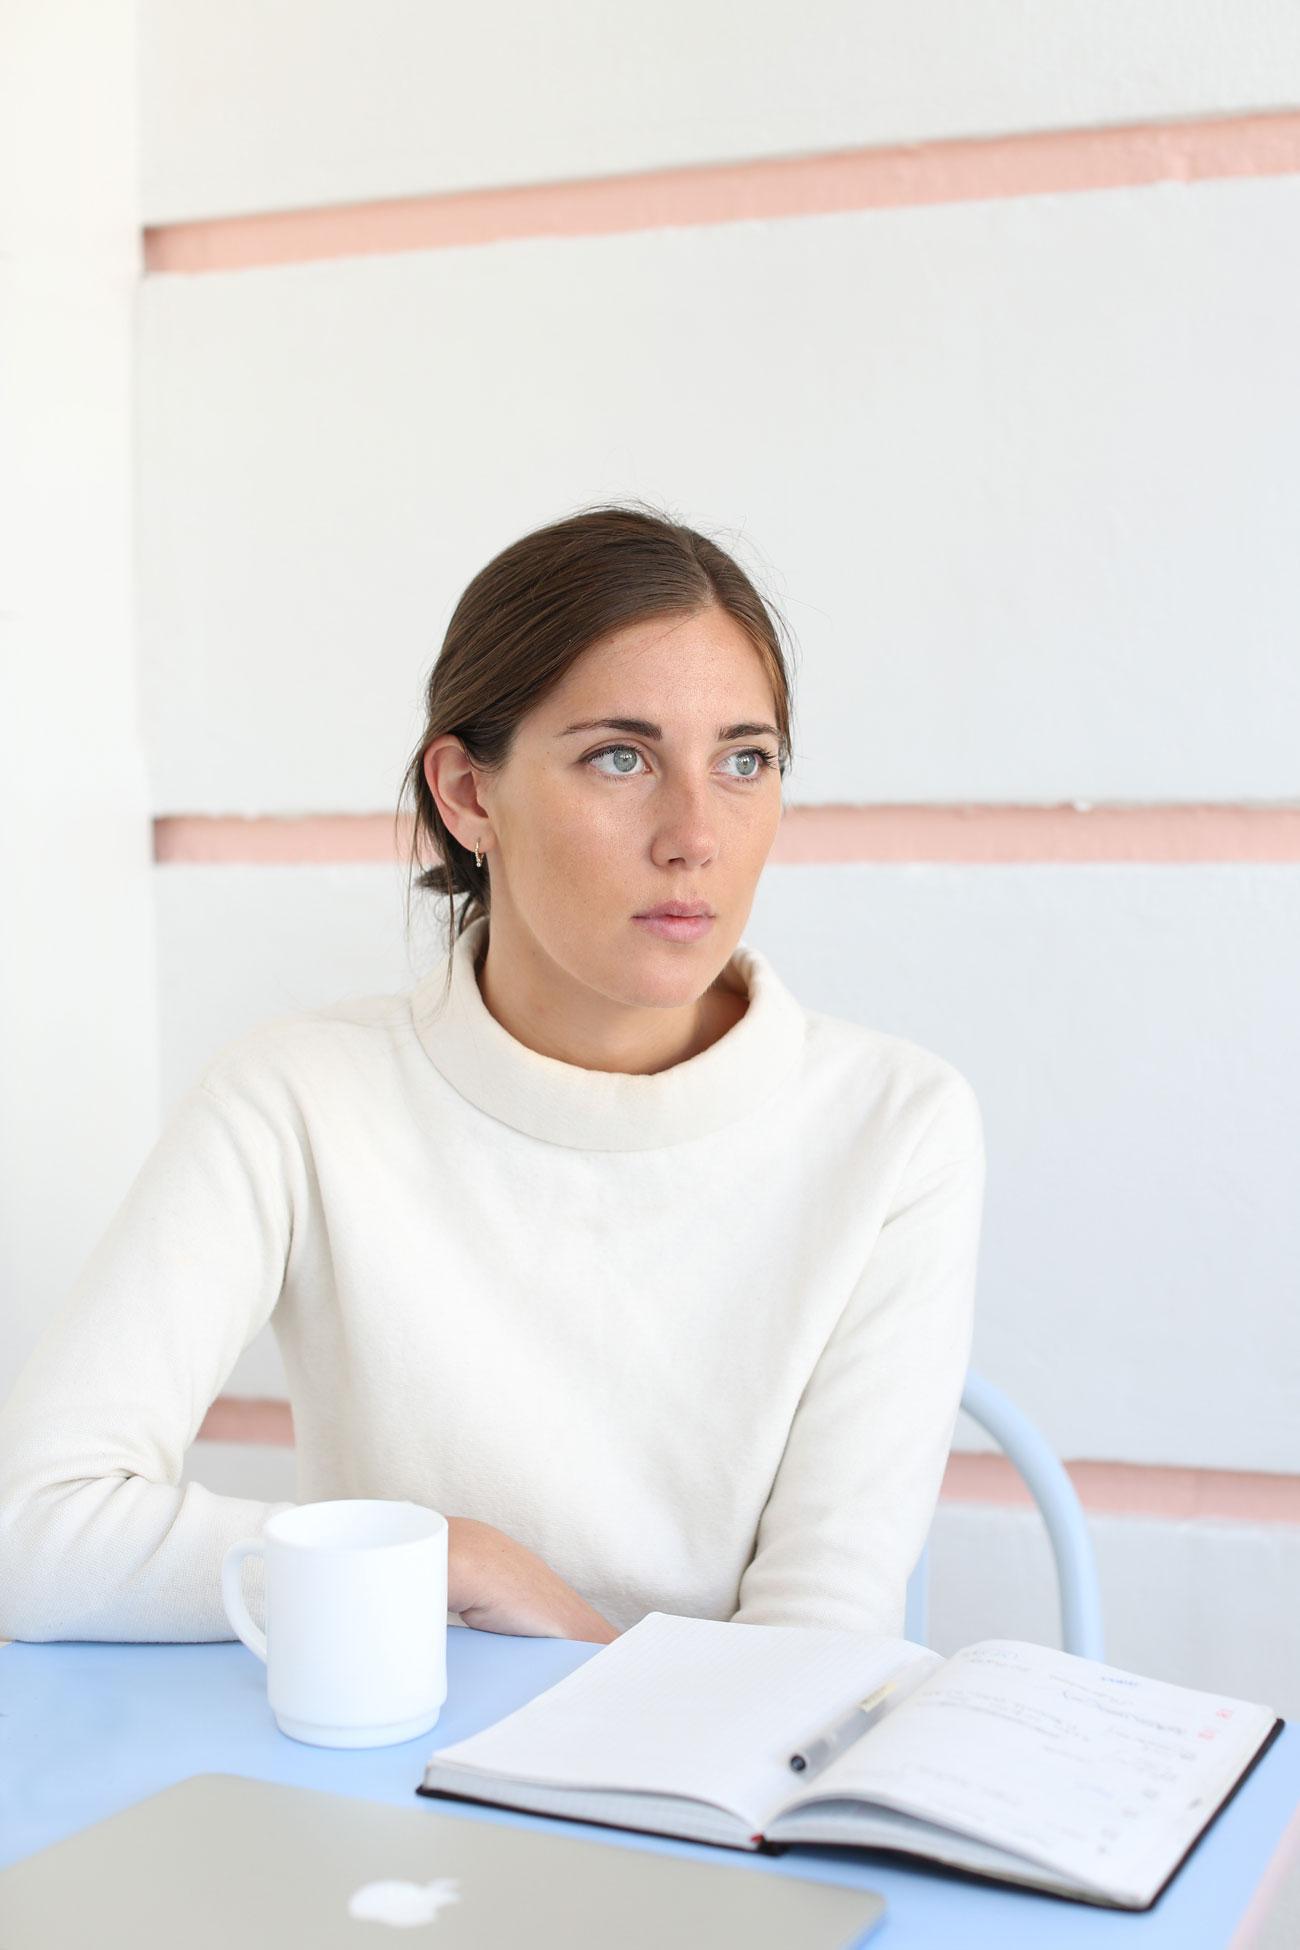 Olivia Sudjic portrait at Cafe Miami by Imogen Freeland